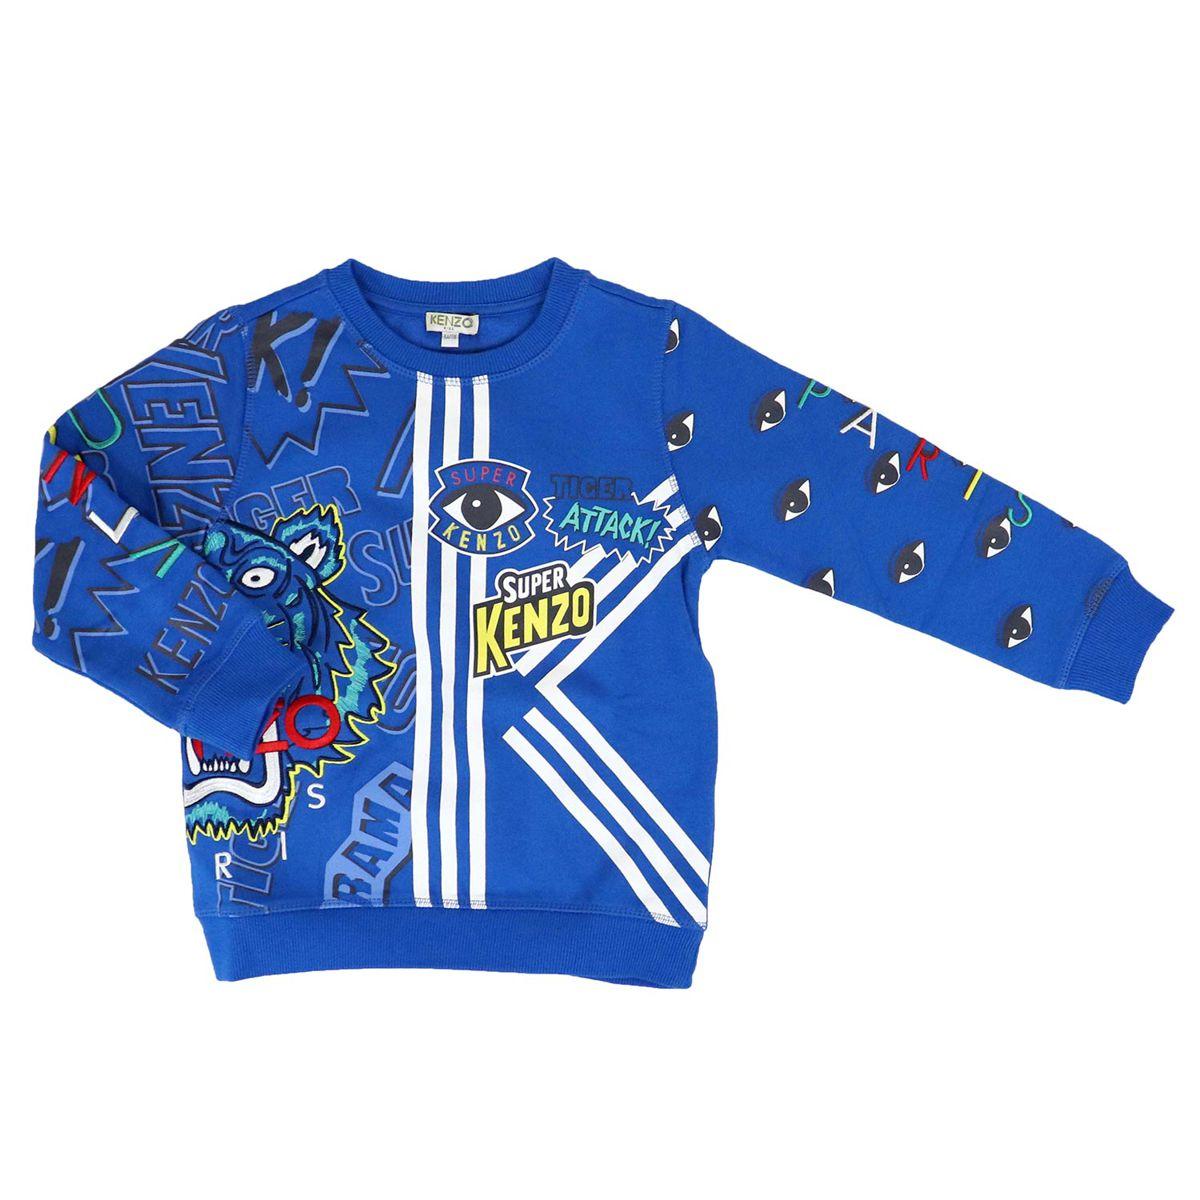 Goddard cotton blend sweatshirt Electr. blue Kenzo